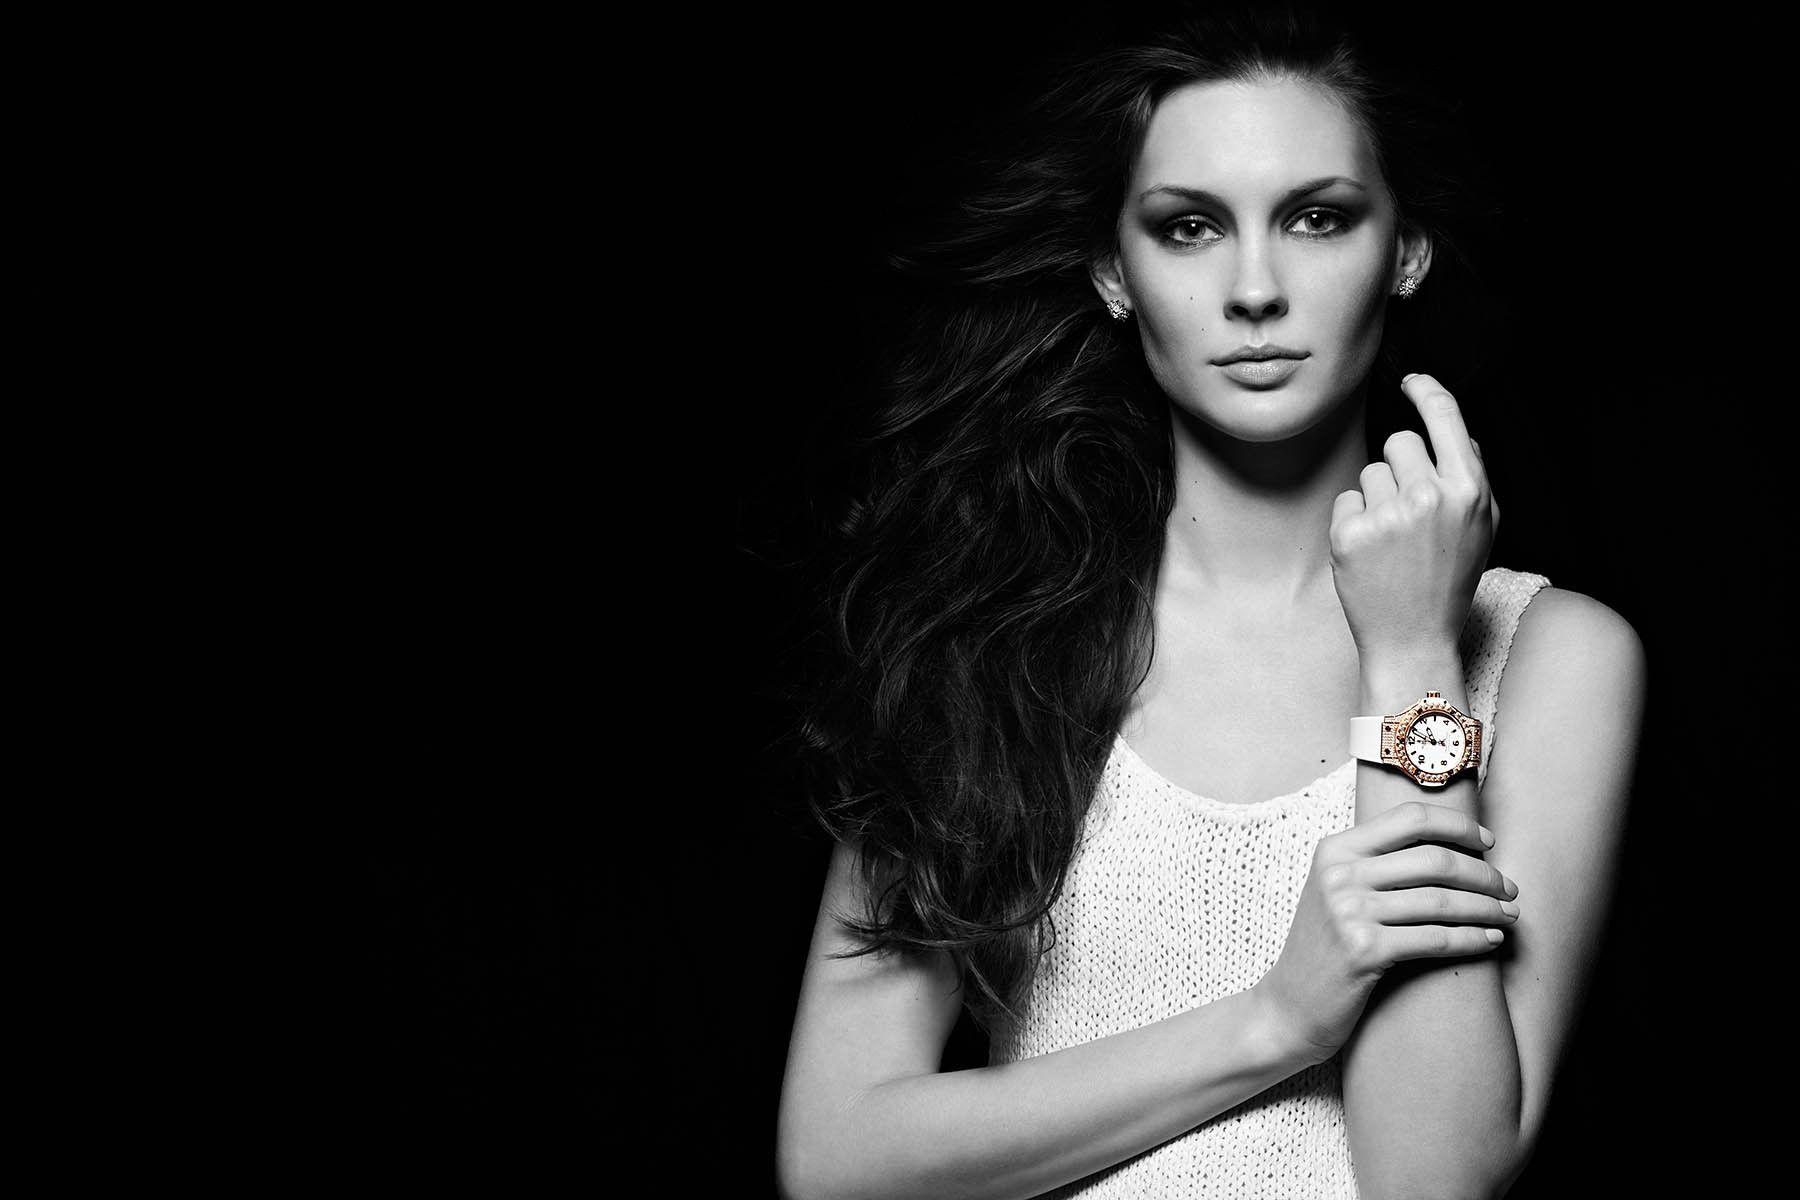 Model: Katherin SchlegelClient: Diamonds International